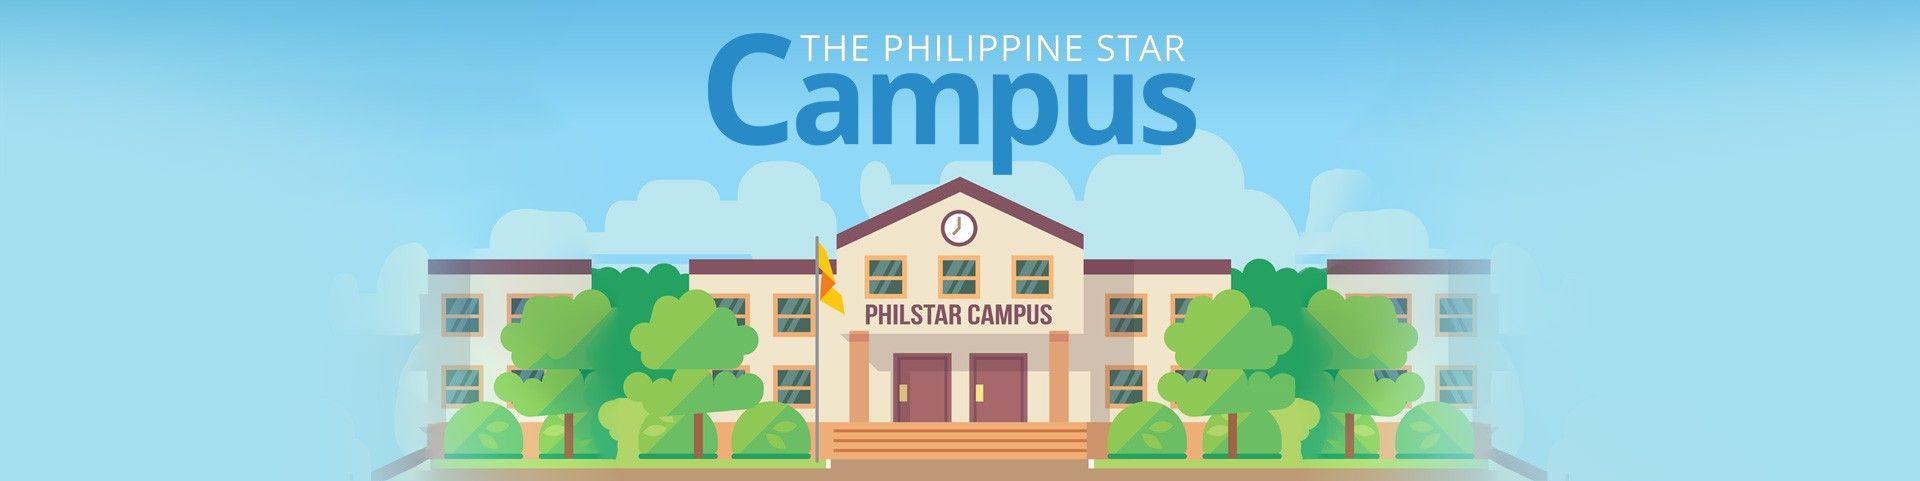 cebu grad tops medical board exam campus philippine star